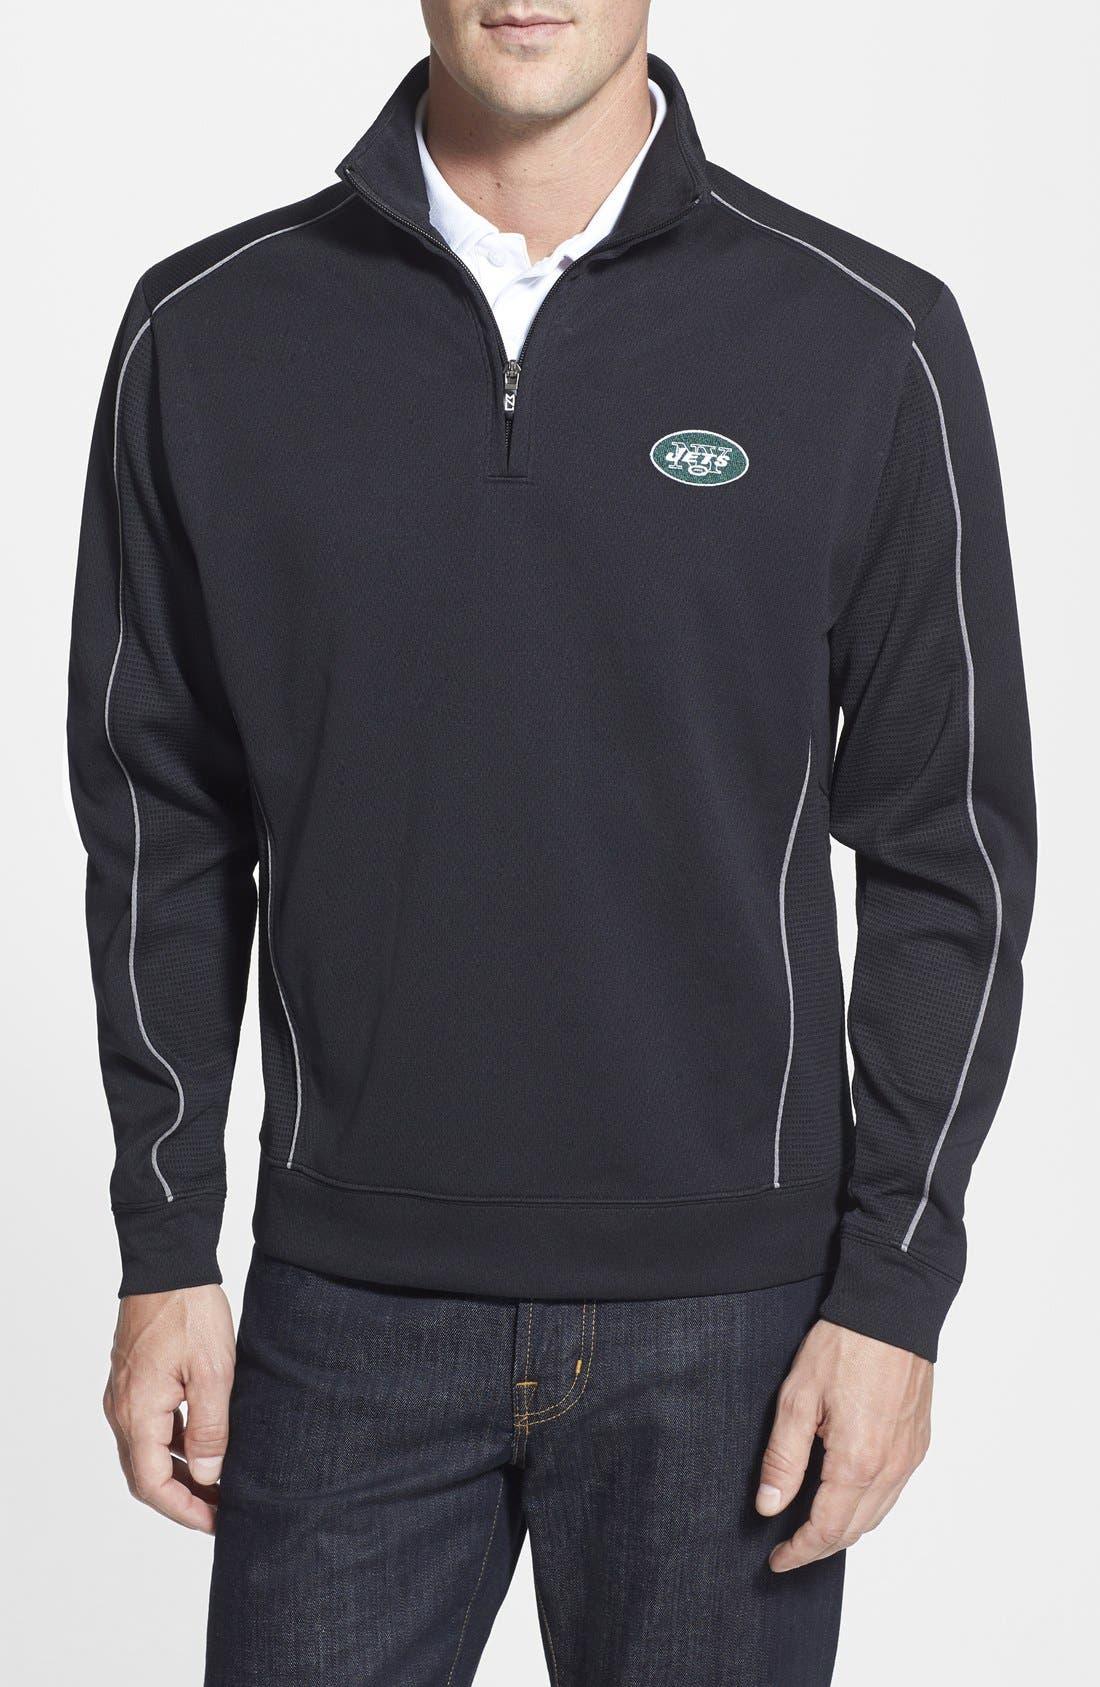 New York Jets - Edge DryTec Moisture Wicking Half Zip Pullover,                             Main thumbnail 1, color,                             001